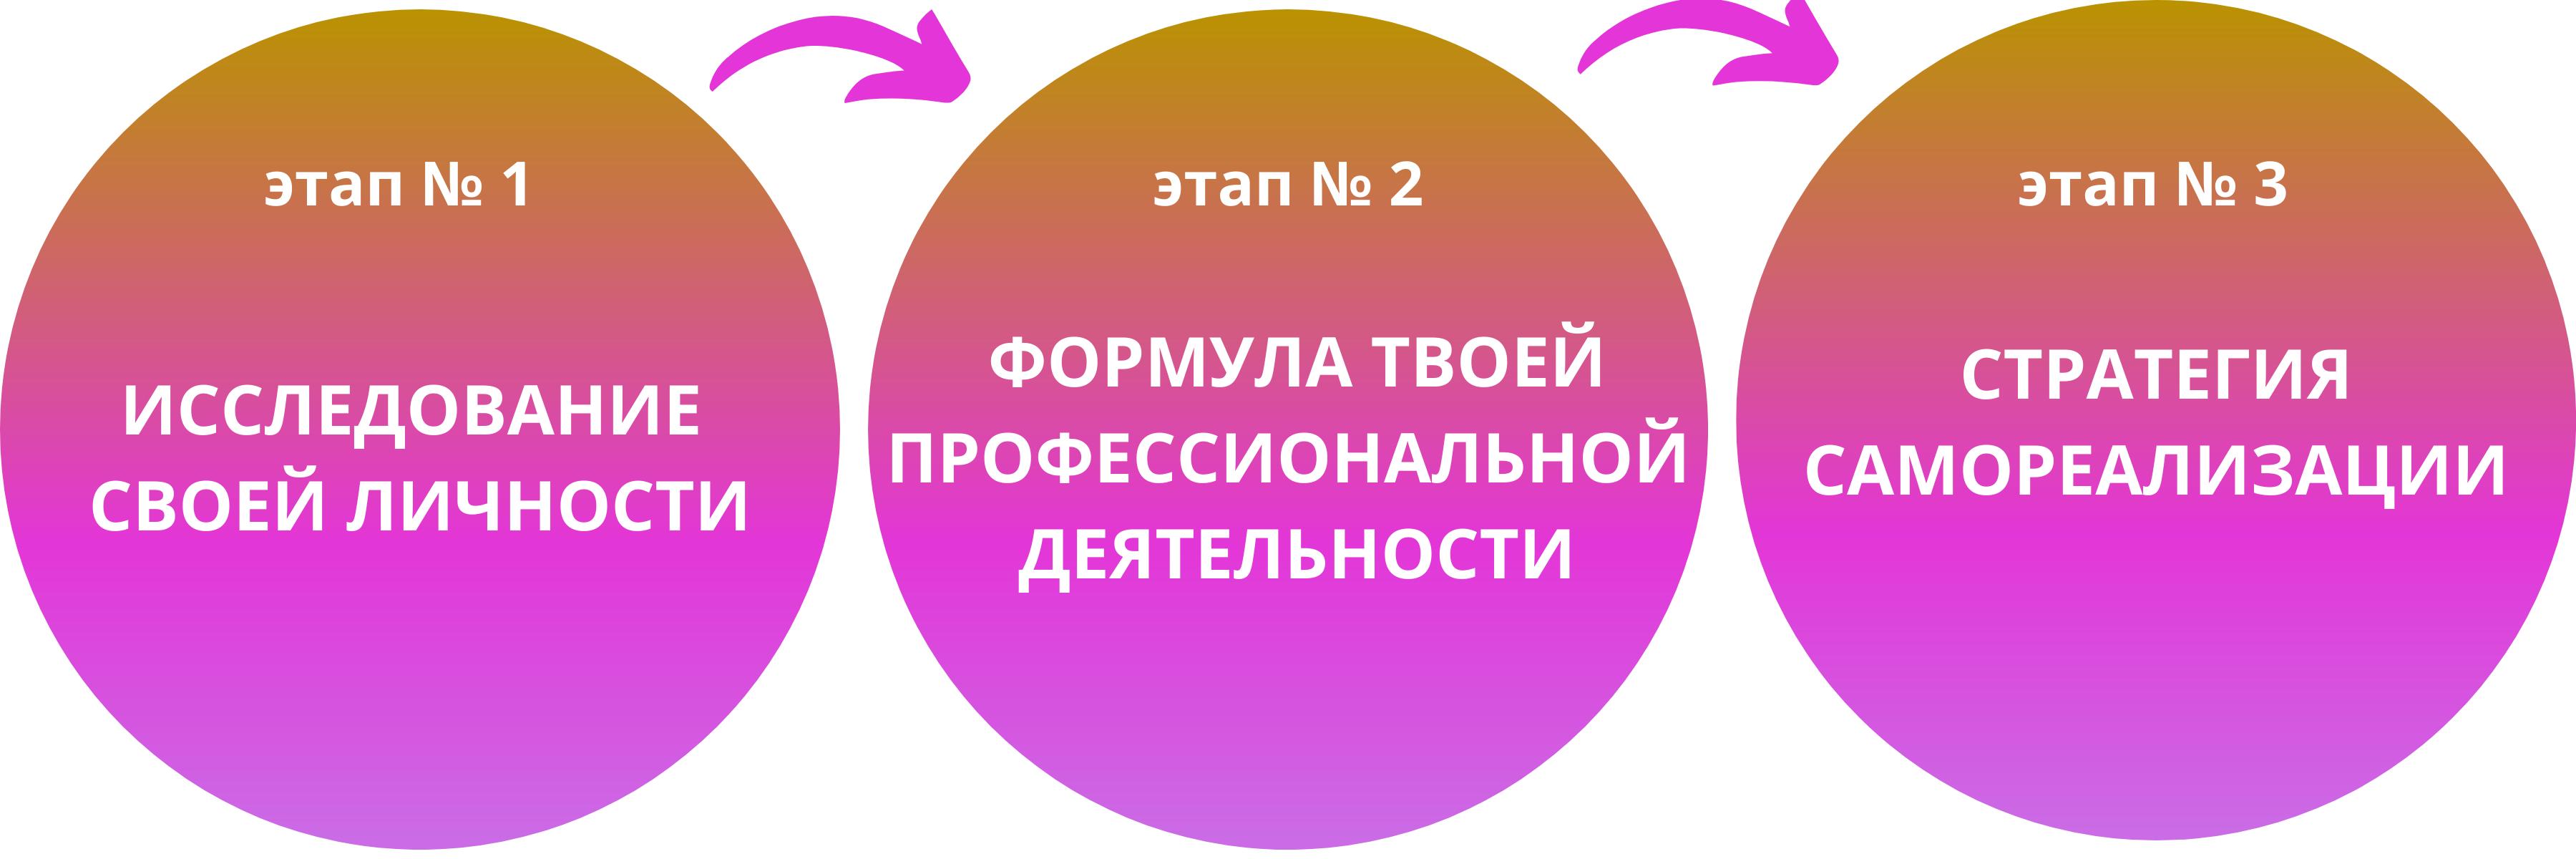 Веселый лучок (3)